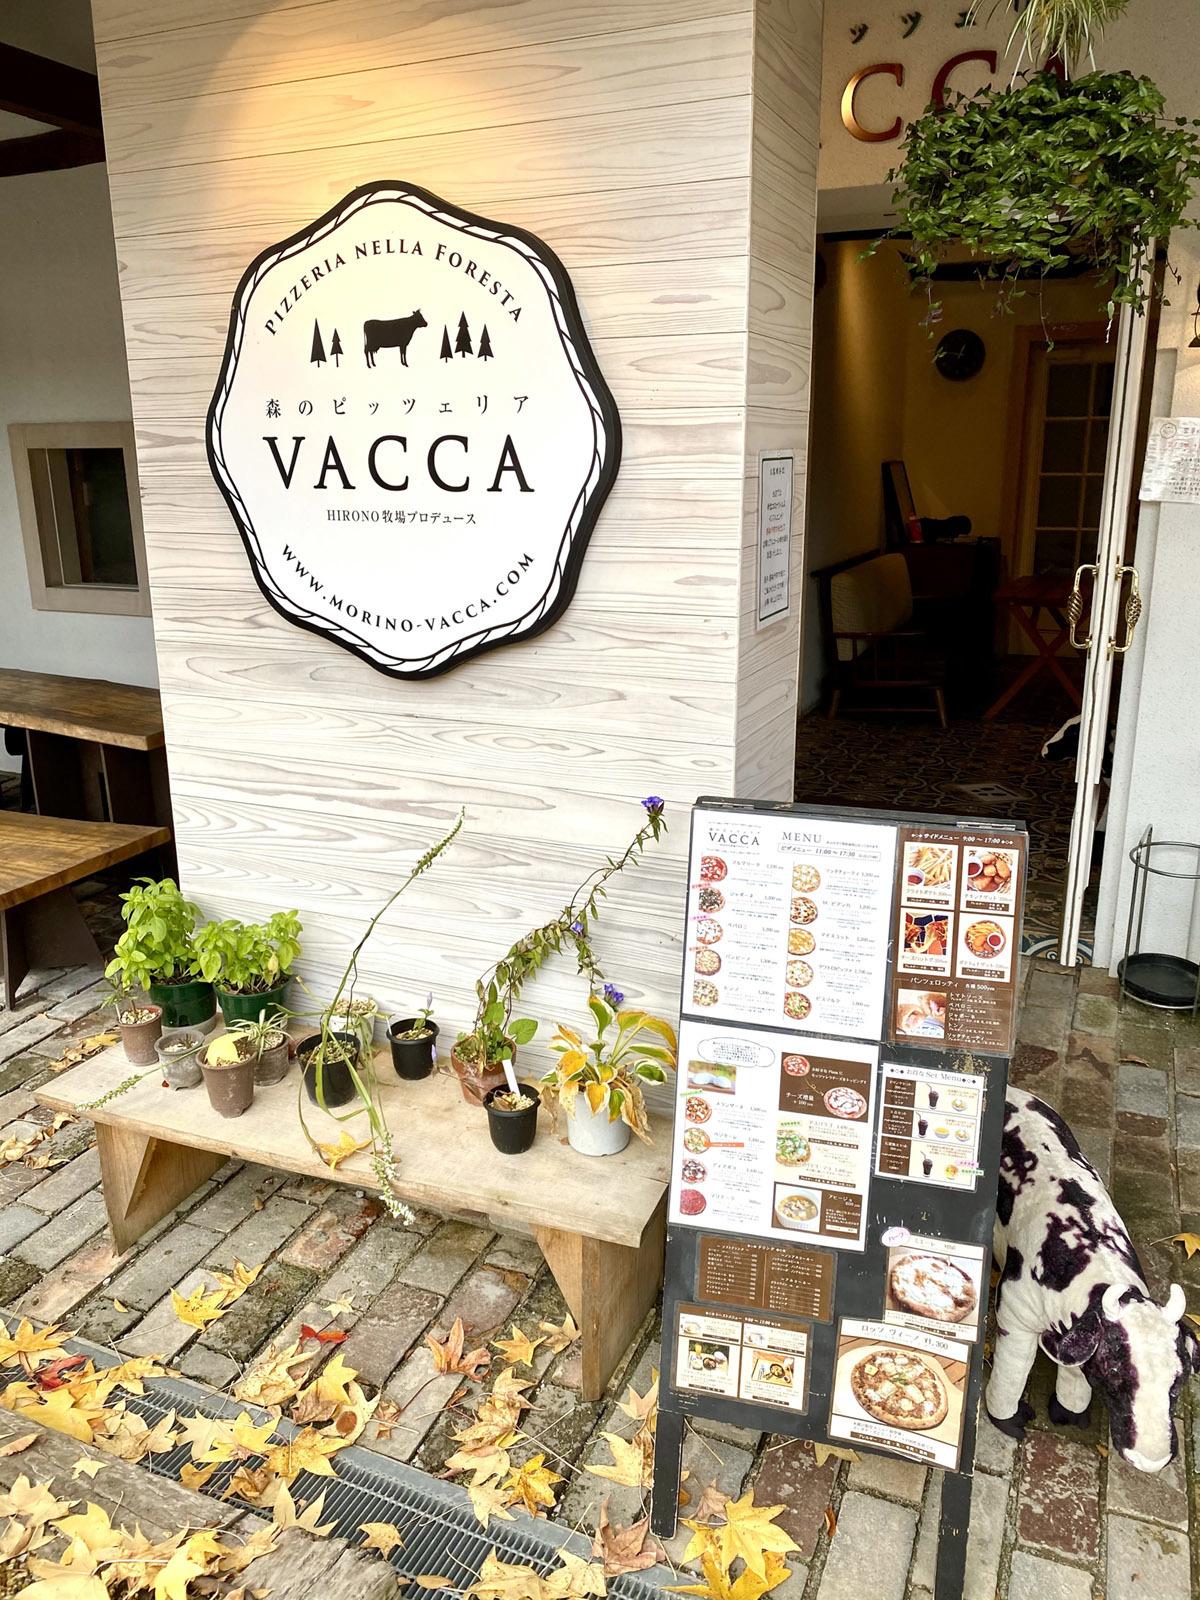 VACCA立て看板